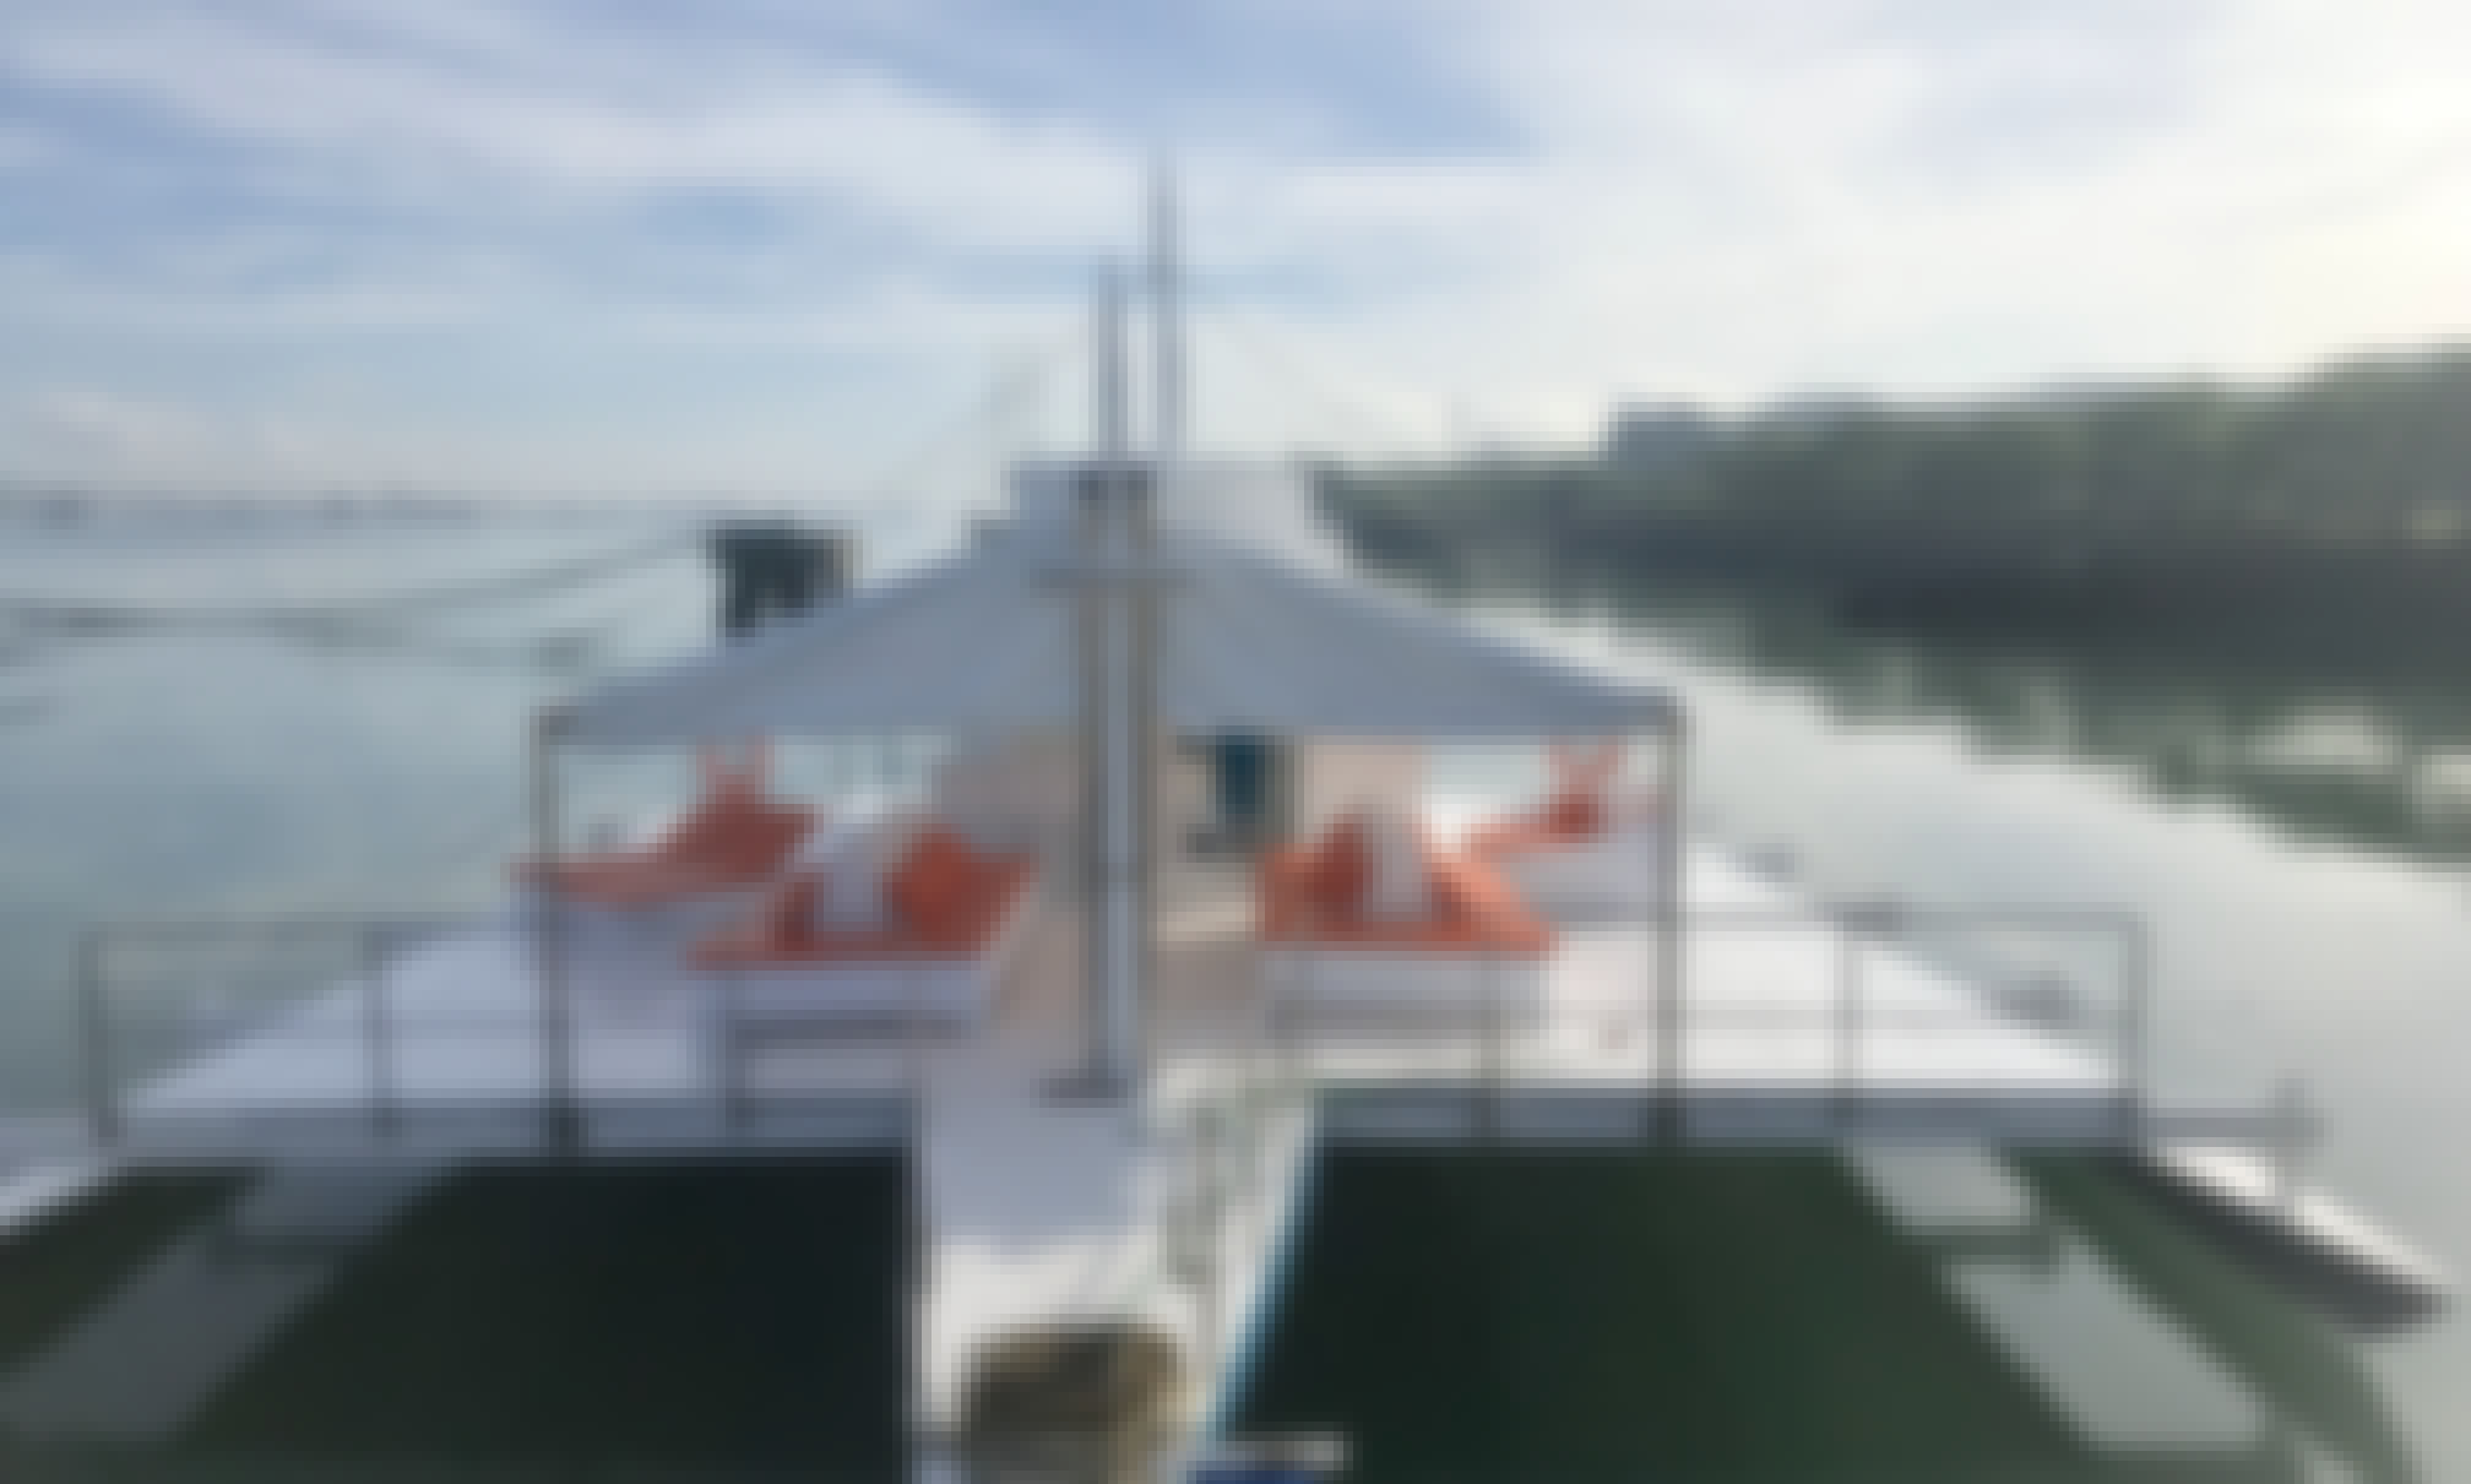 80' Trimaran Party Boat Charter in Lapu-Lapu City, Philippines